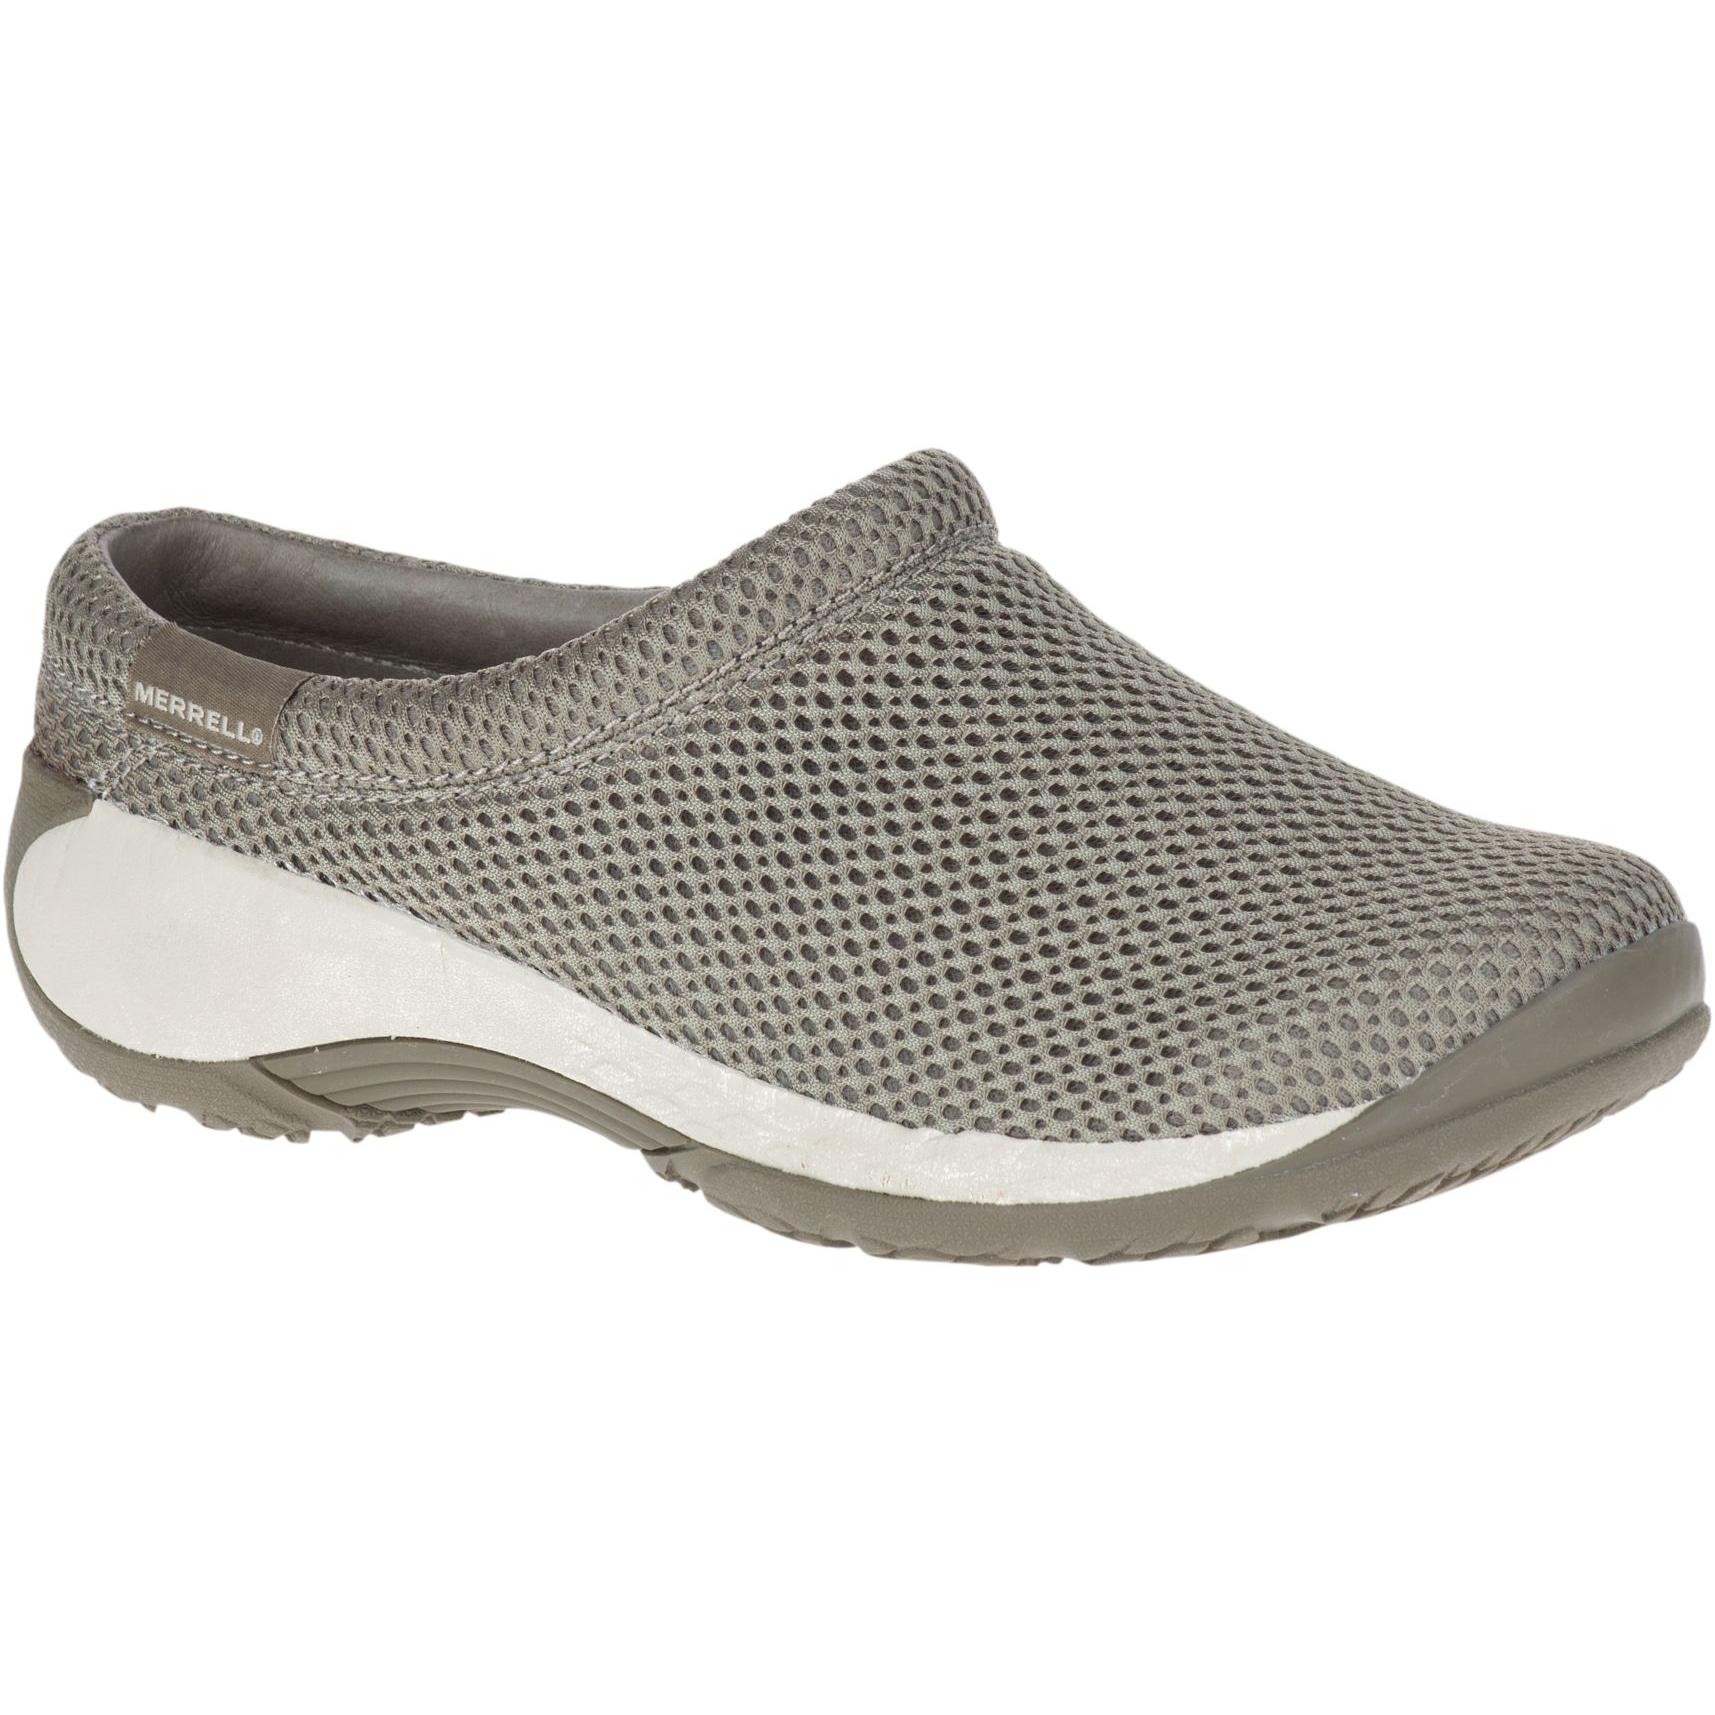 Encore Q2 Breeze Shoe - Women's